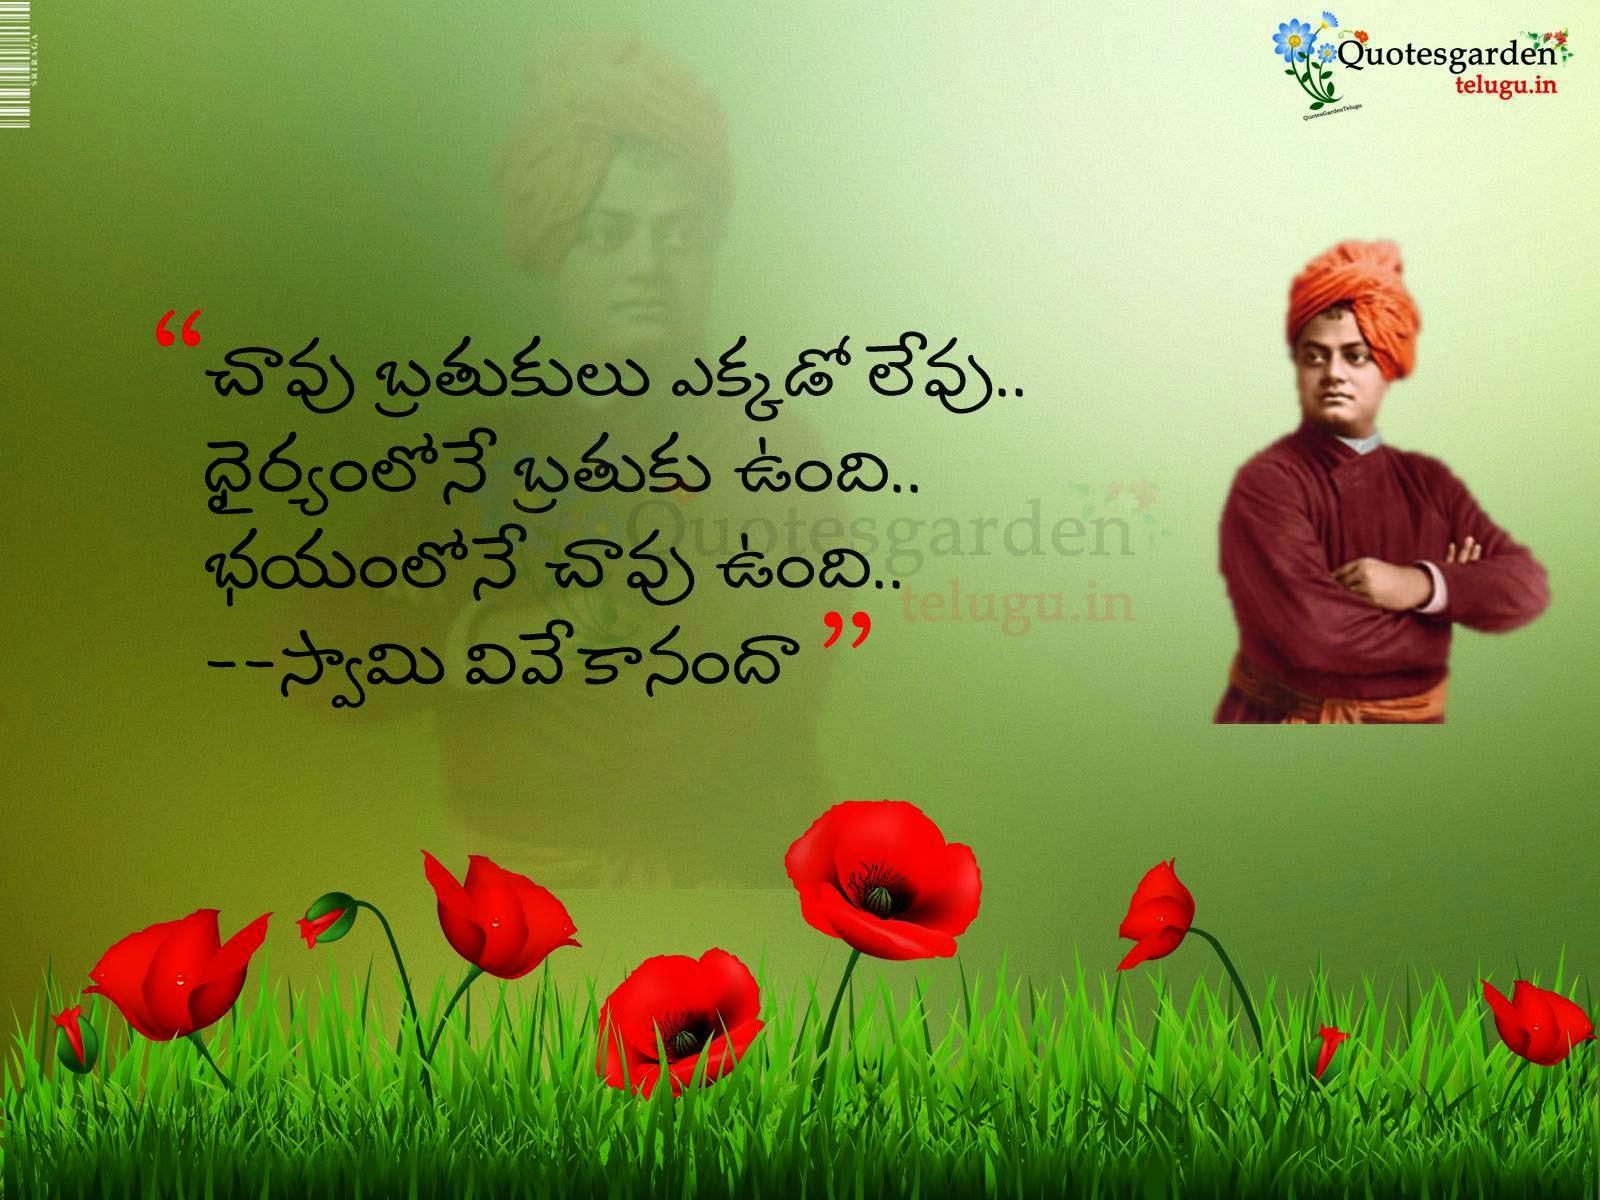 Famous Inspirational Quotes Life Vivekananda Telugu Quotes  Top Telugu Inspirational Quotes